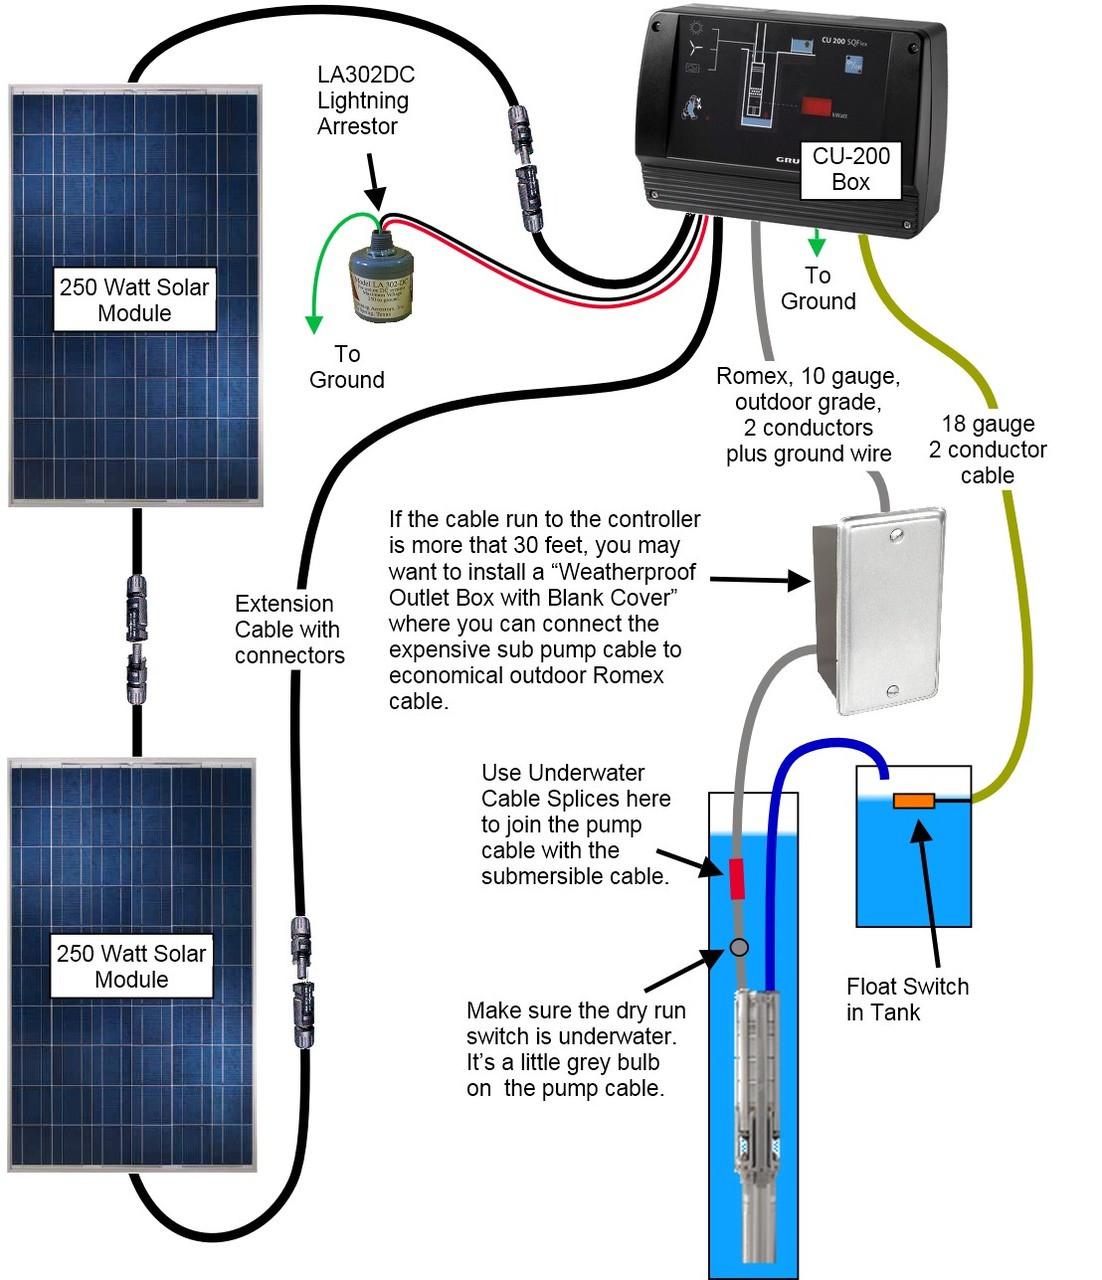 Grundfos Solar Panel Wiring Diagram Worksheet And Cell Sqflex 40sqf 5 4 Centrifugal Well Pump Rh Humboldtsolarwaterpump Com Components